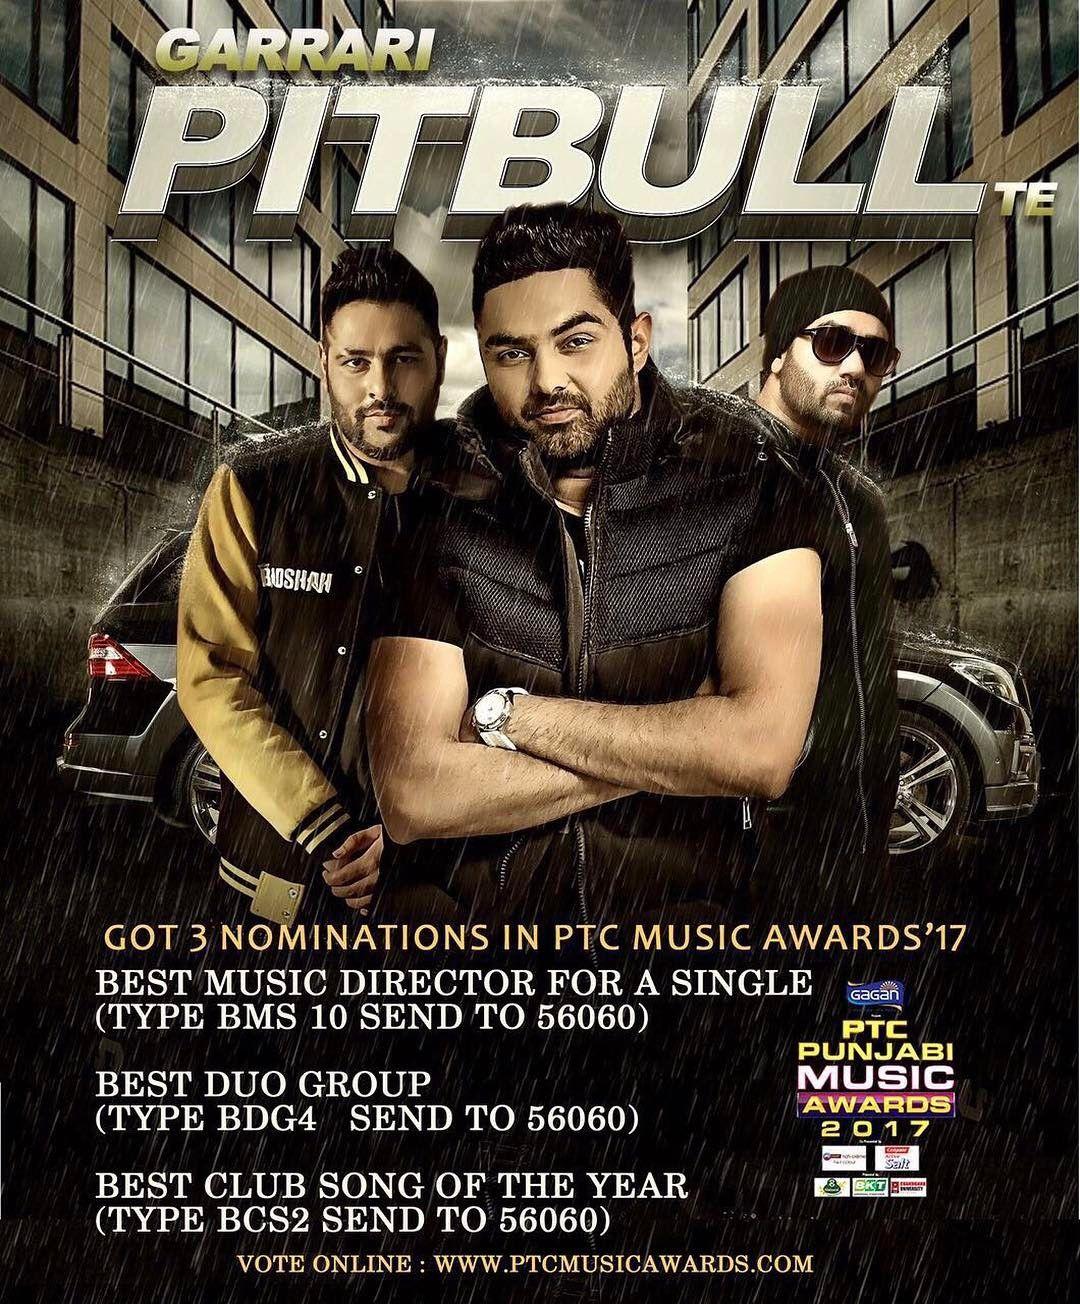 Lao Ji Tuhade Pyar Karke Aagiyan 3 Nominations For Garaari Pitbull Te Paado Vote Hun Dabbke Raigurinder Jslsing Pitbull Songs Pitbull Music Pitbull Lyrics